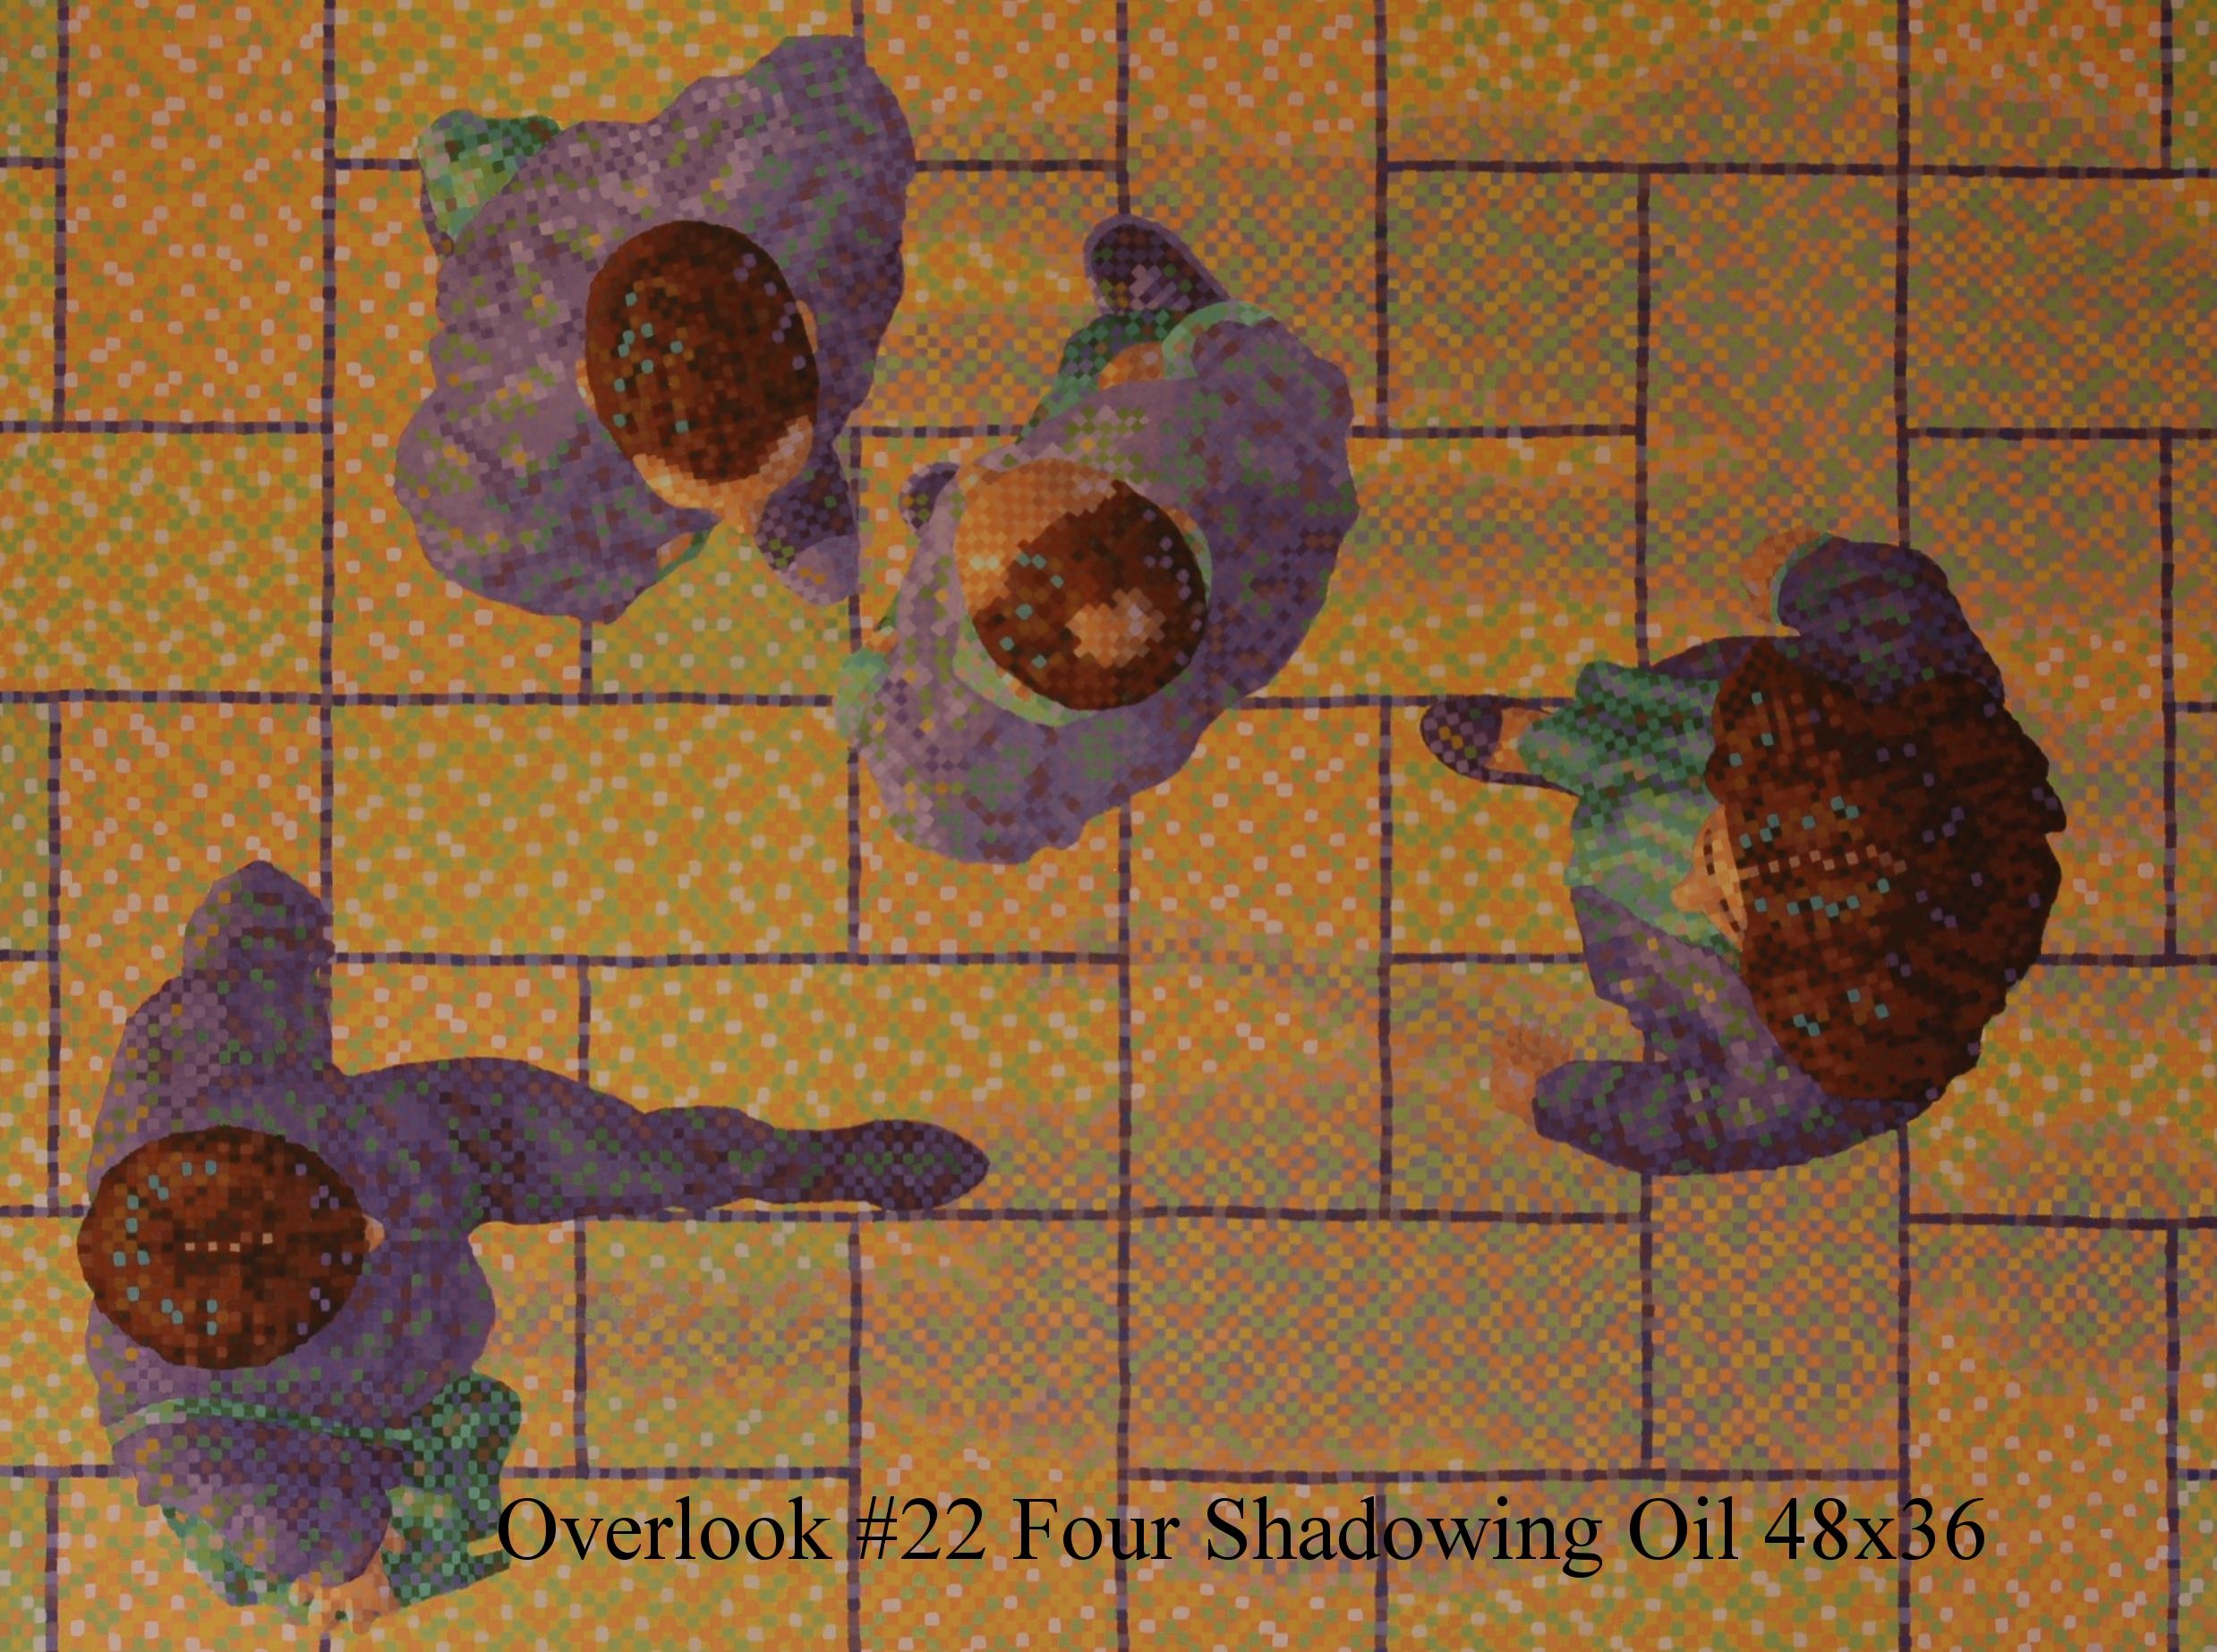 Overlook #22 Four Shadowing view 1.jpg